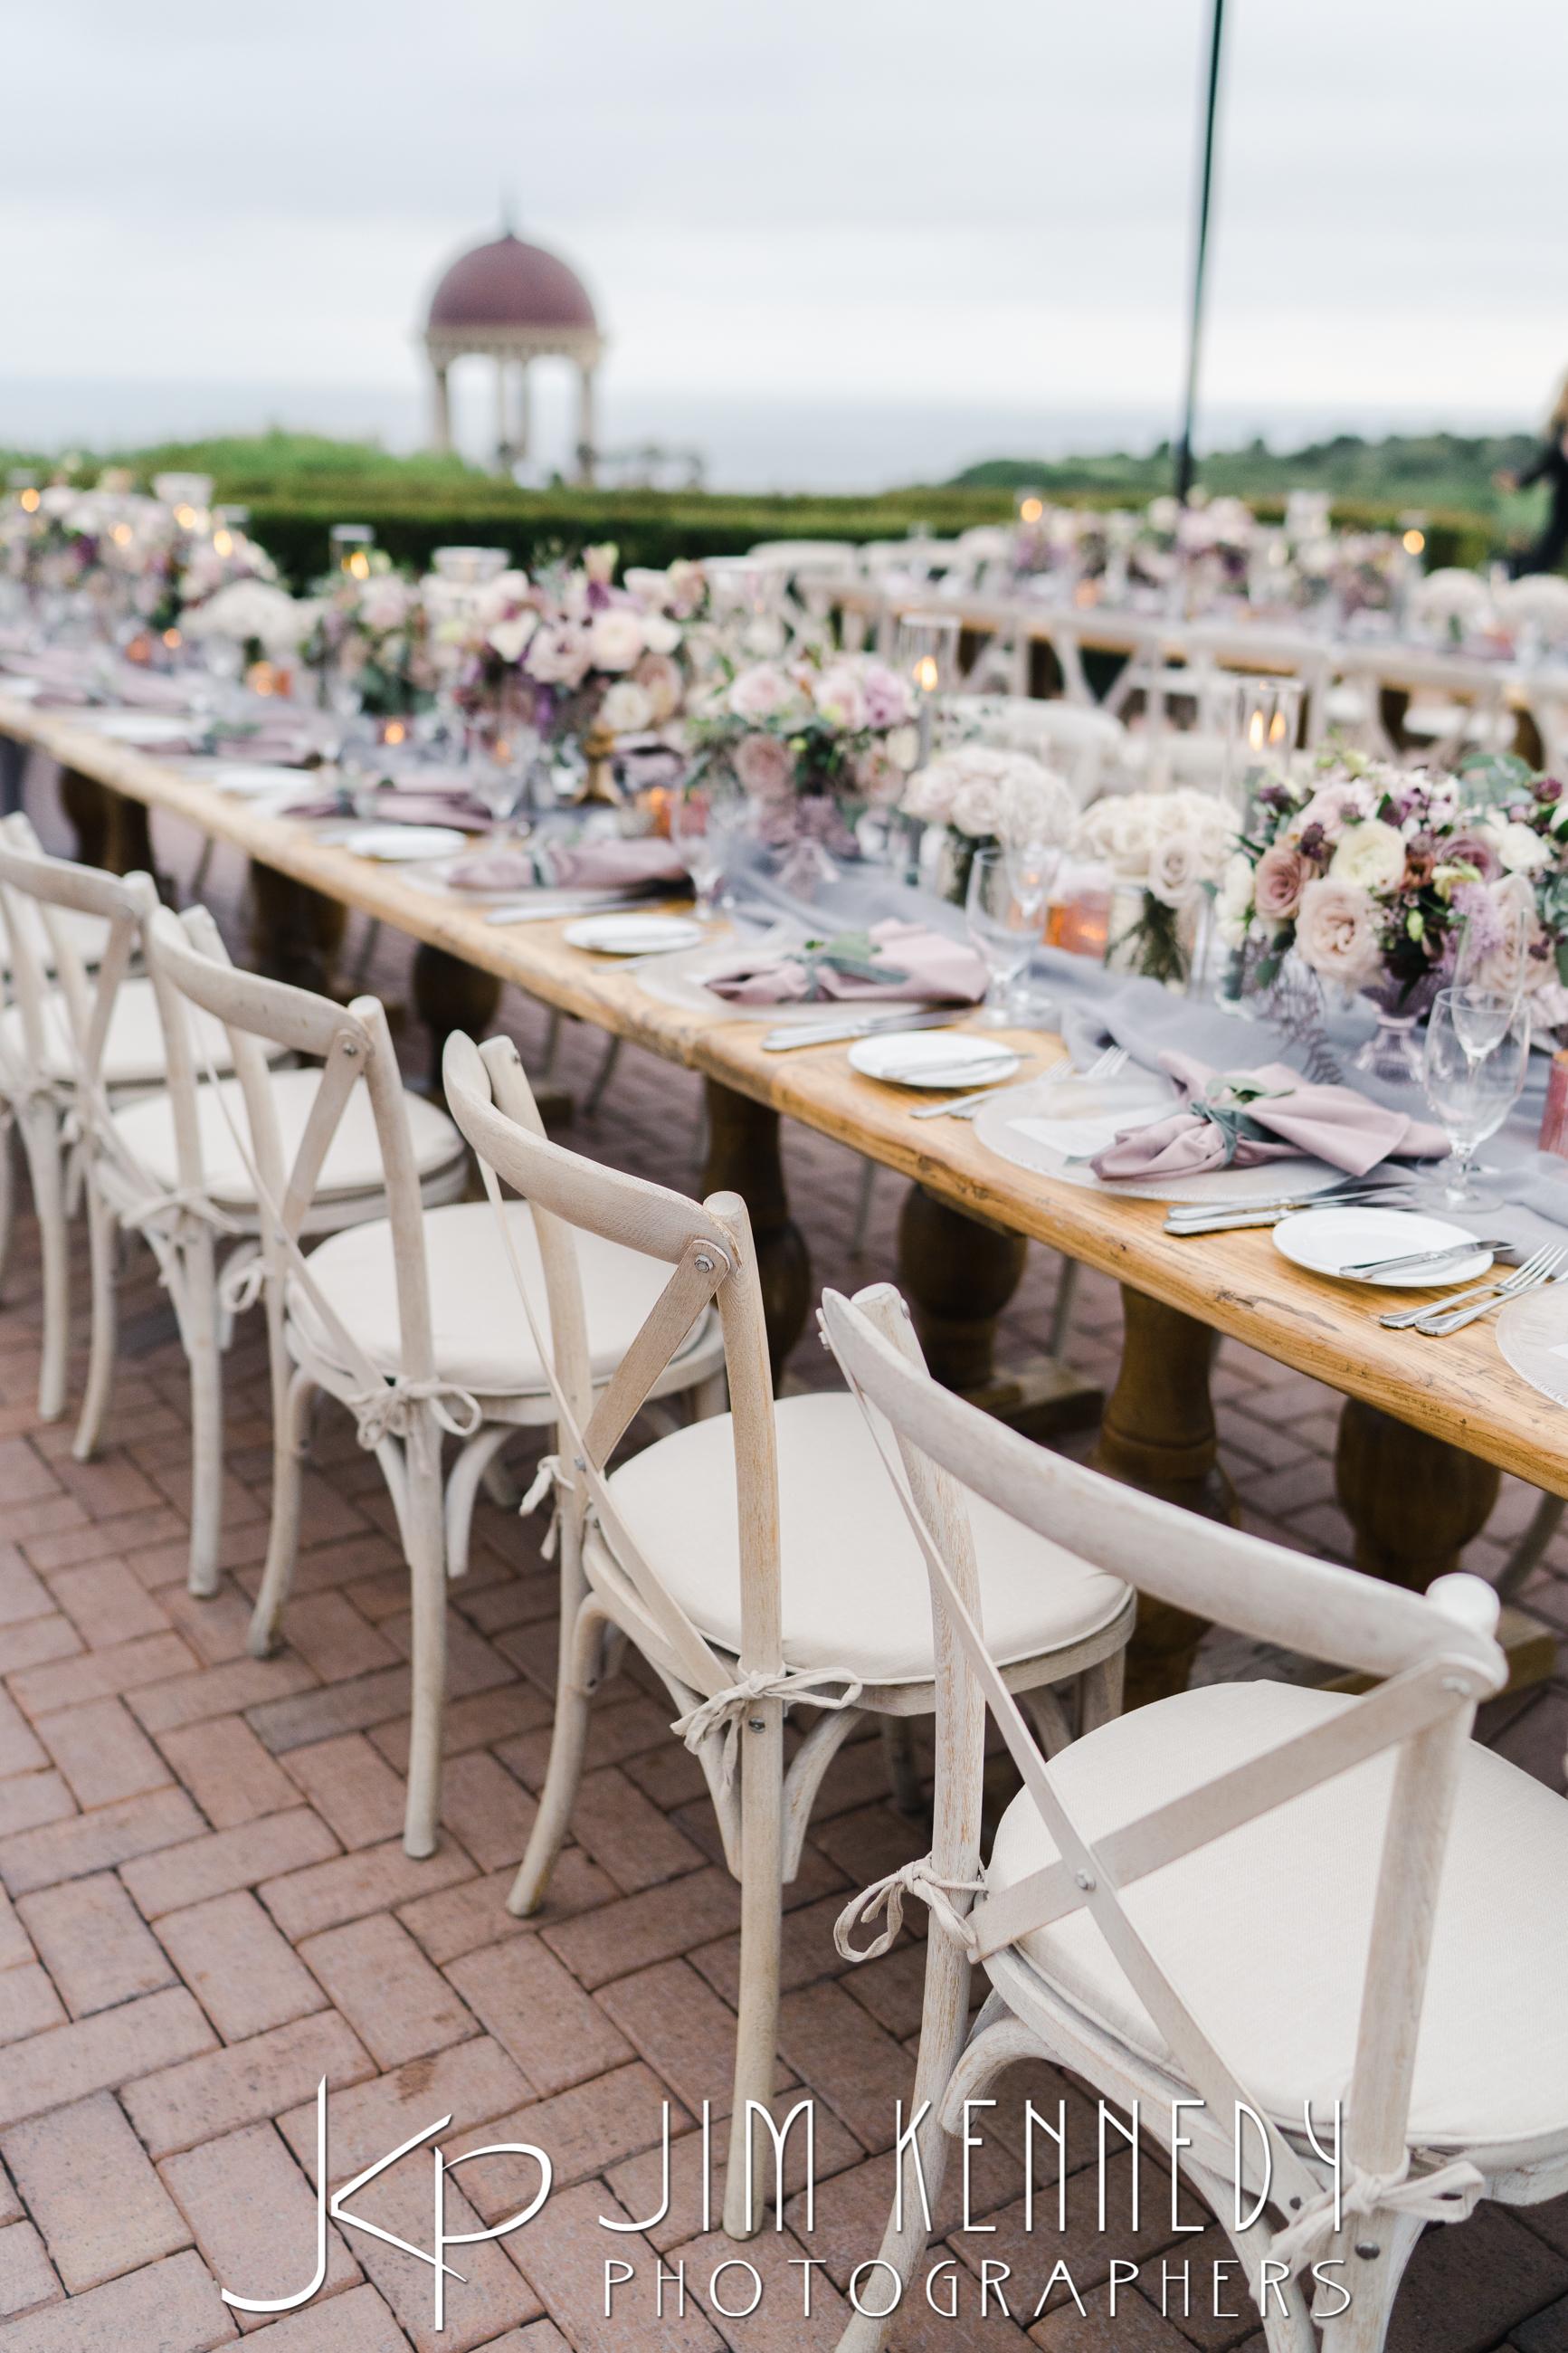 pelican-hill-wedding-jim-kenedy-photographers_0197.JPG